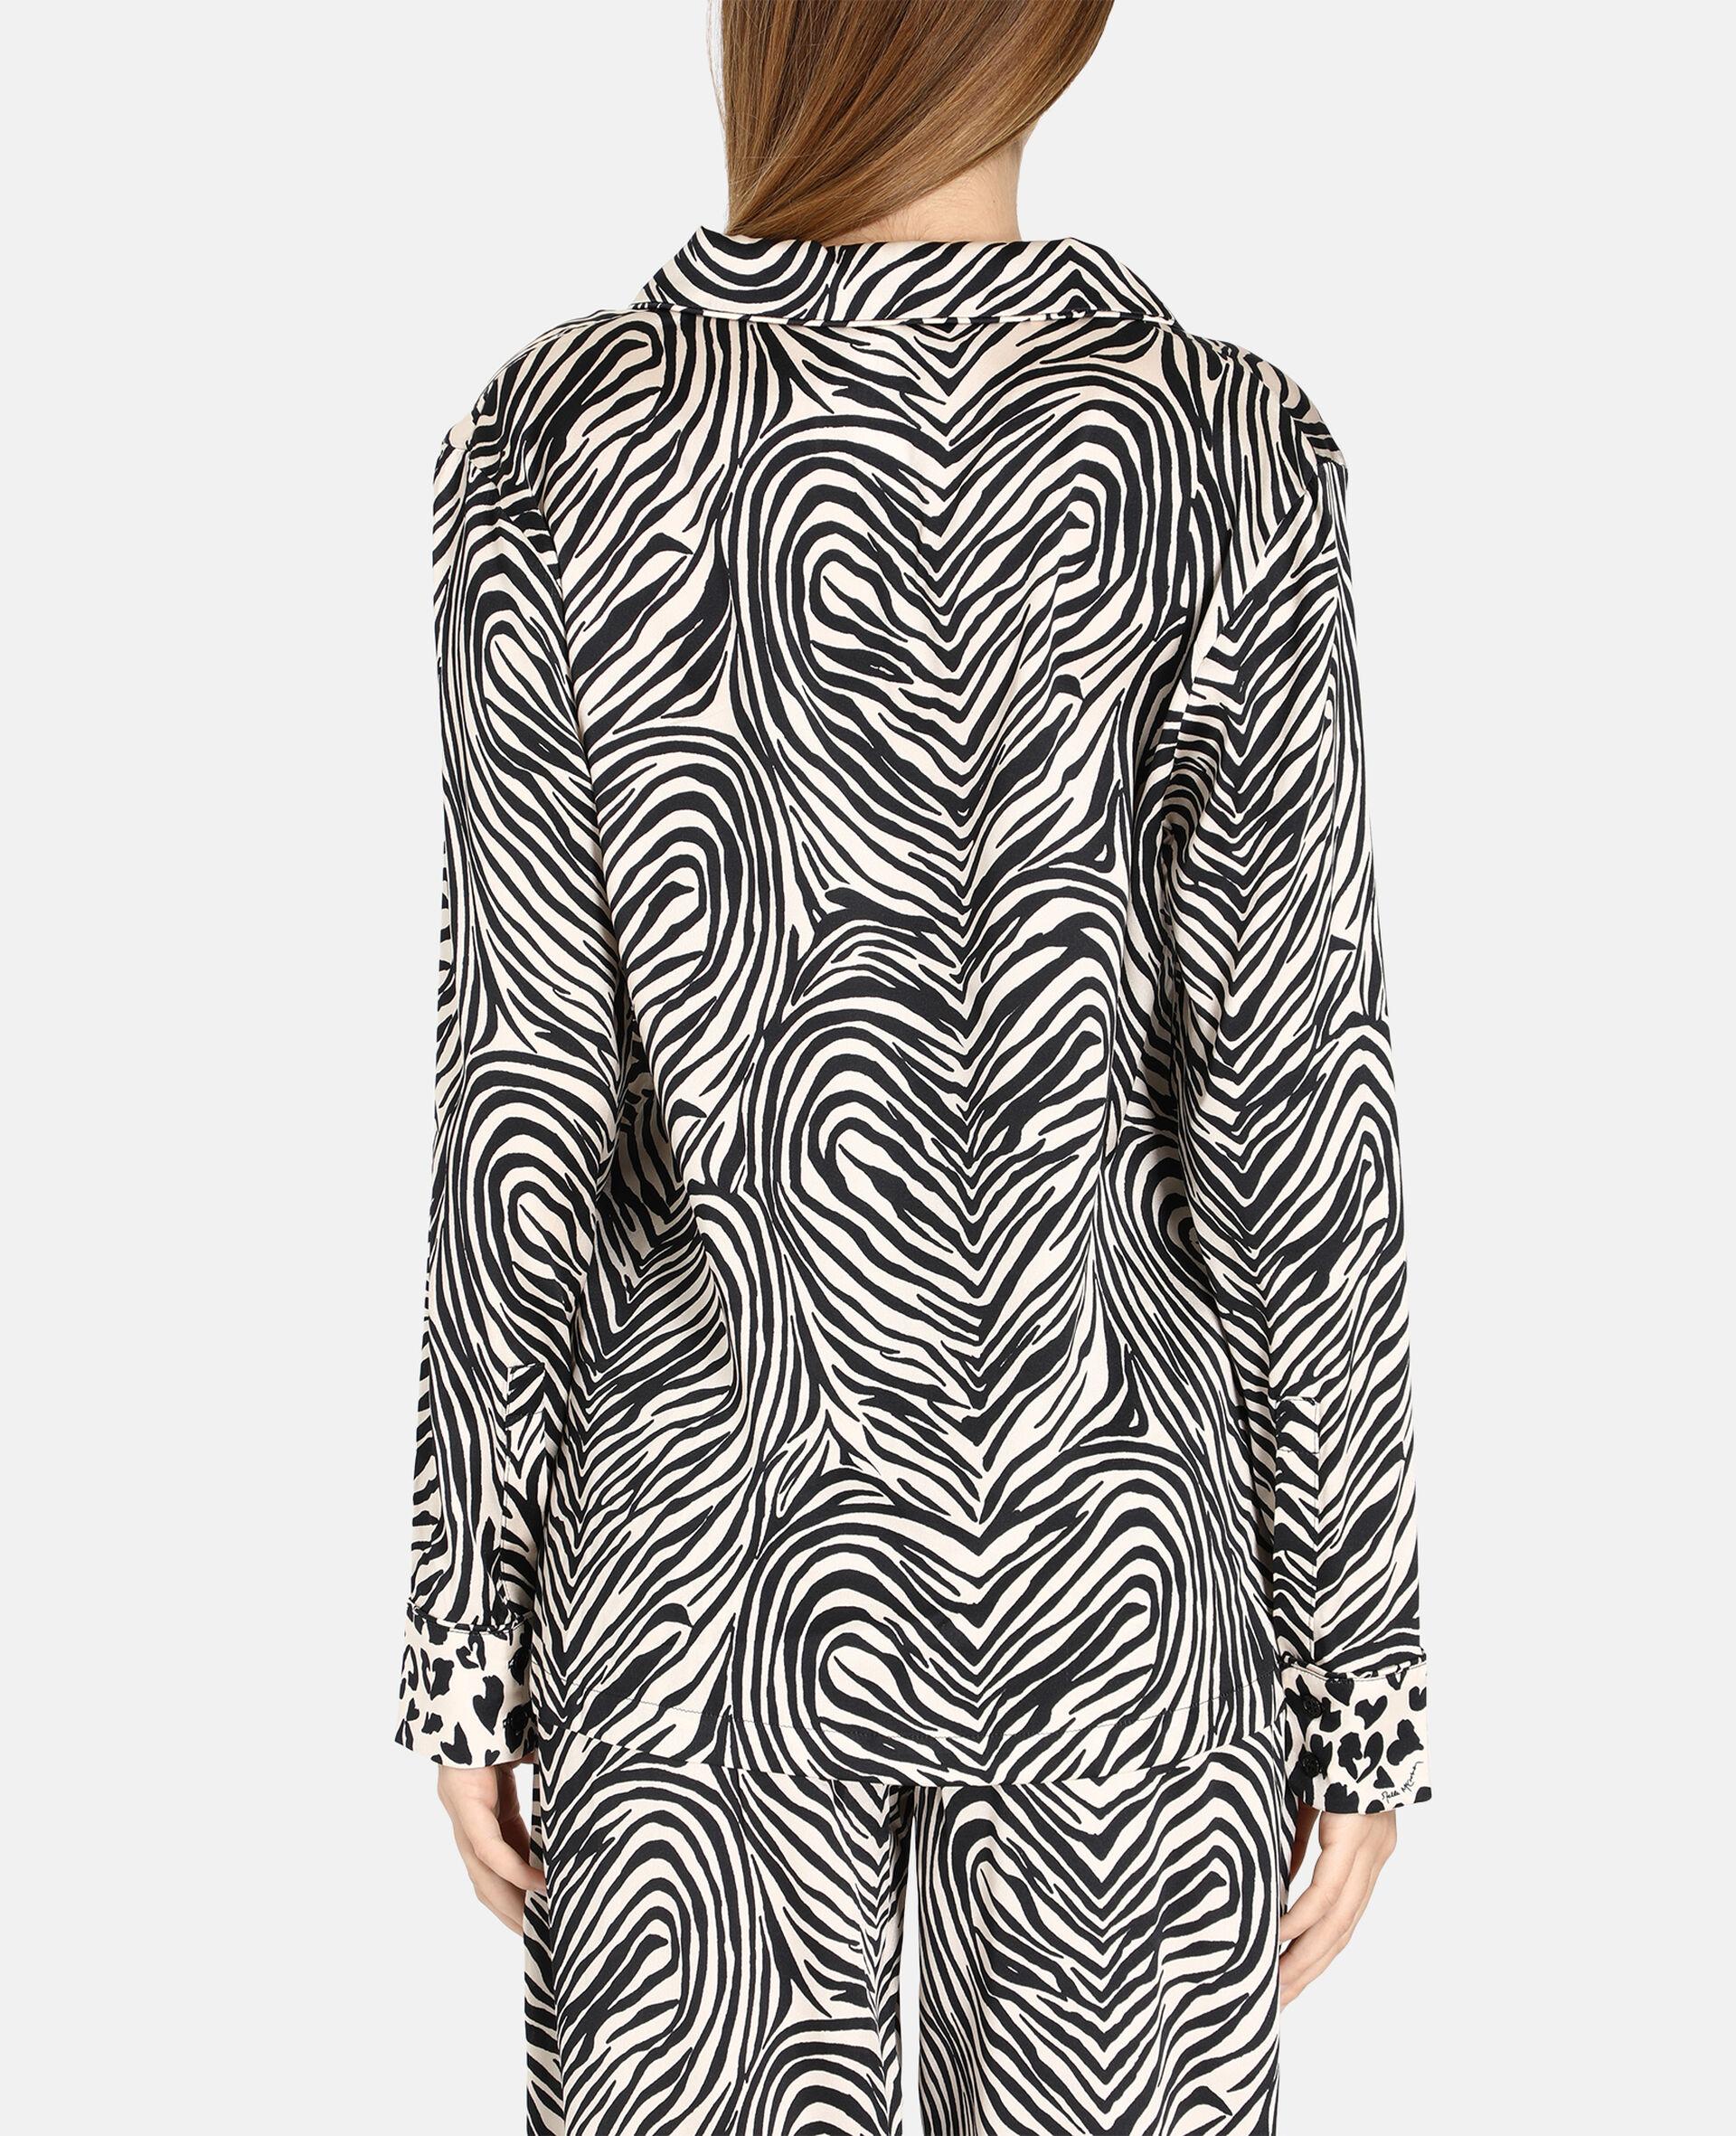 Maggie Twisting Shirt-Beige-large image number 2